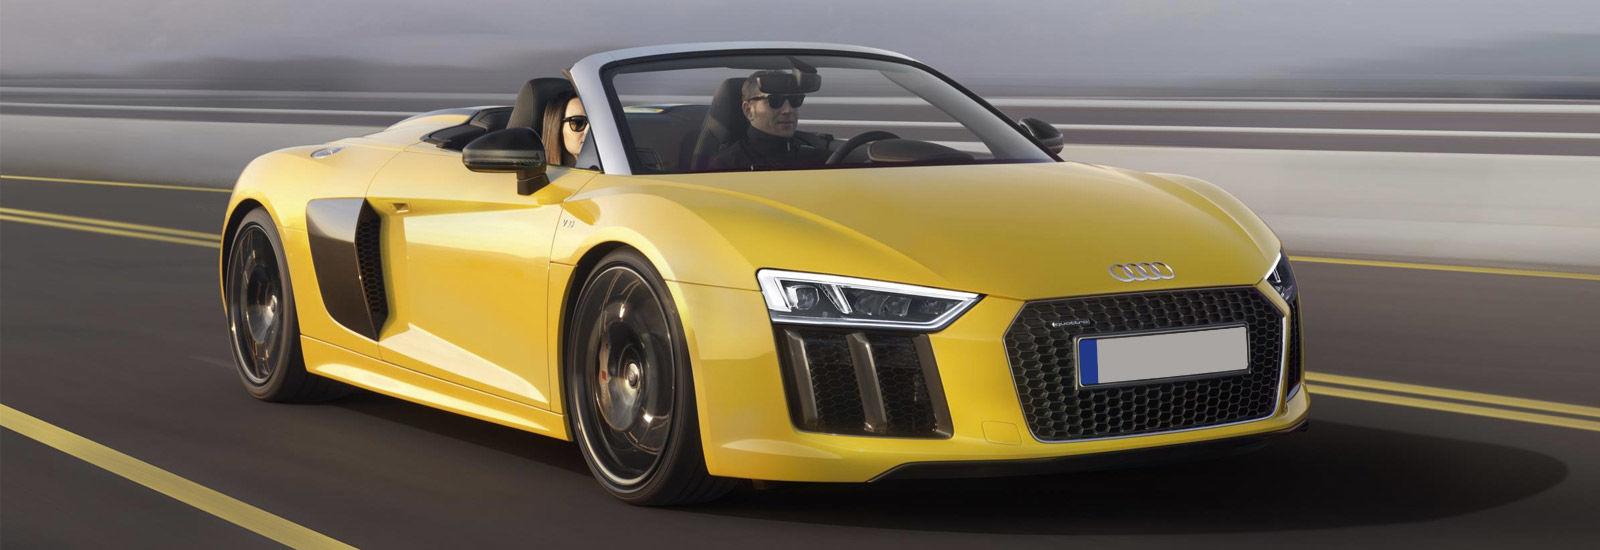 Audi R V Spyder Price Specs And Release Date Carwow - Audi r8 v10 spyder